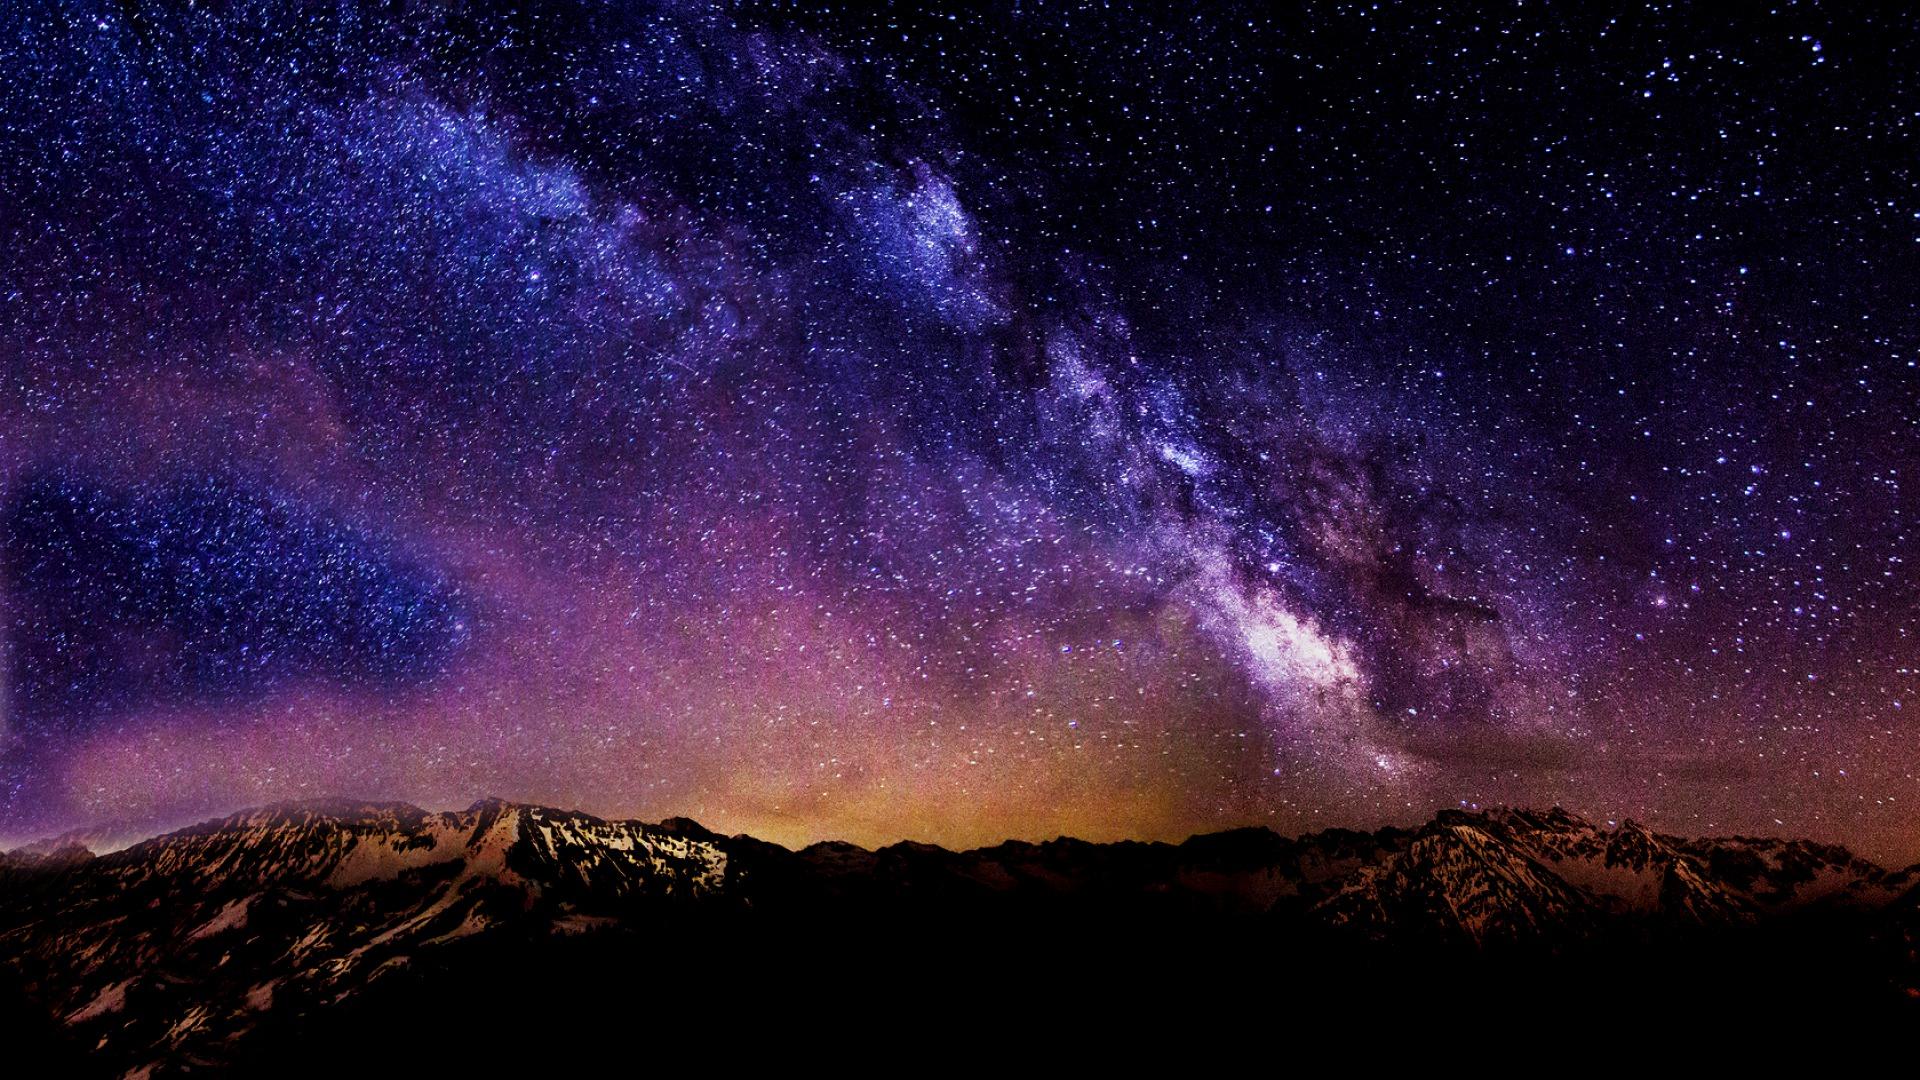 Night Sky Background Wallpaper - WallpaperSafari